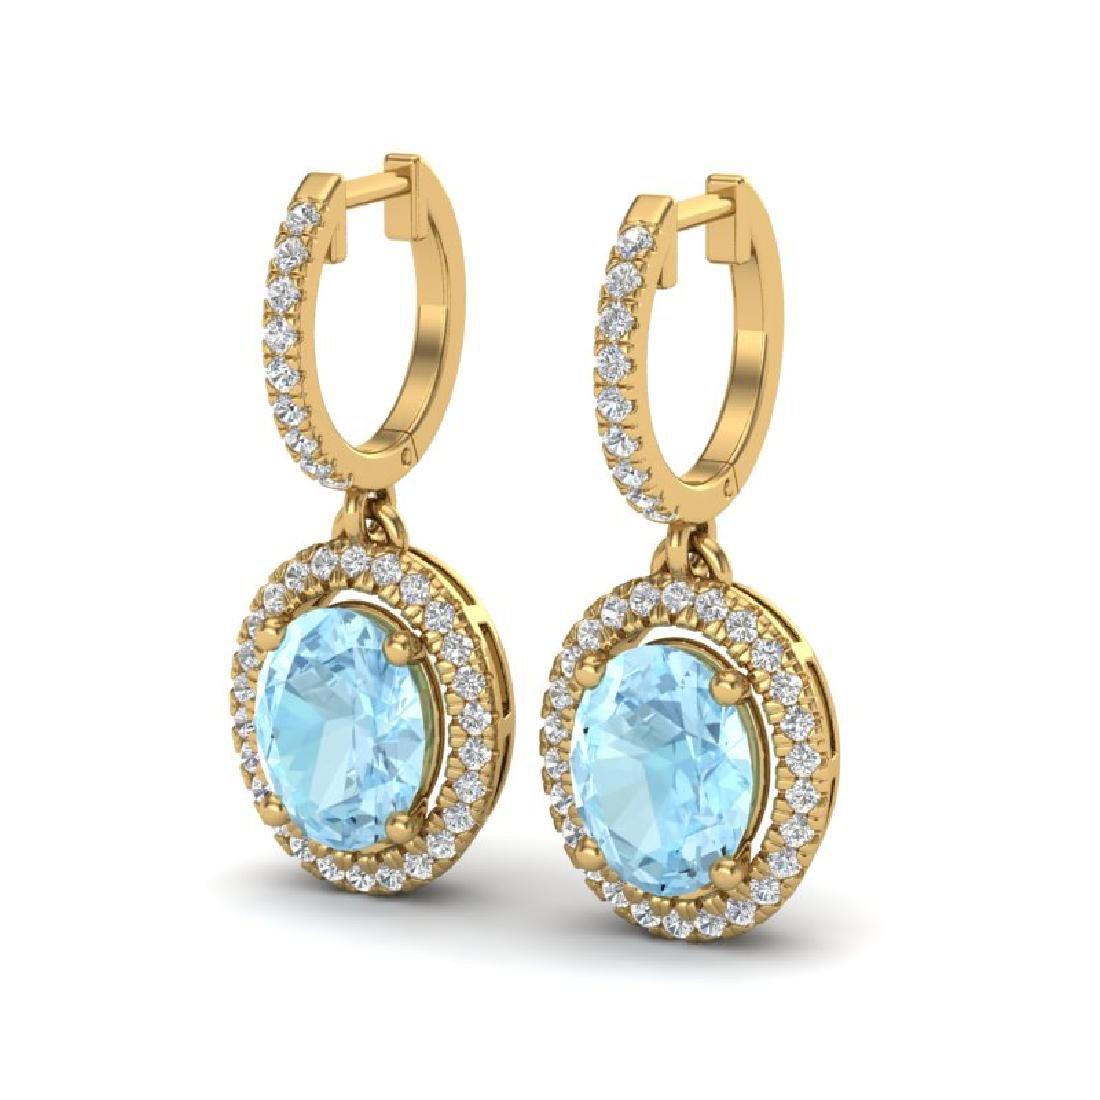 3.25 CTW Aquamarine & Micro Pave VS/SI Diamond Earrings